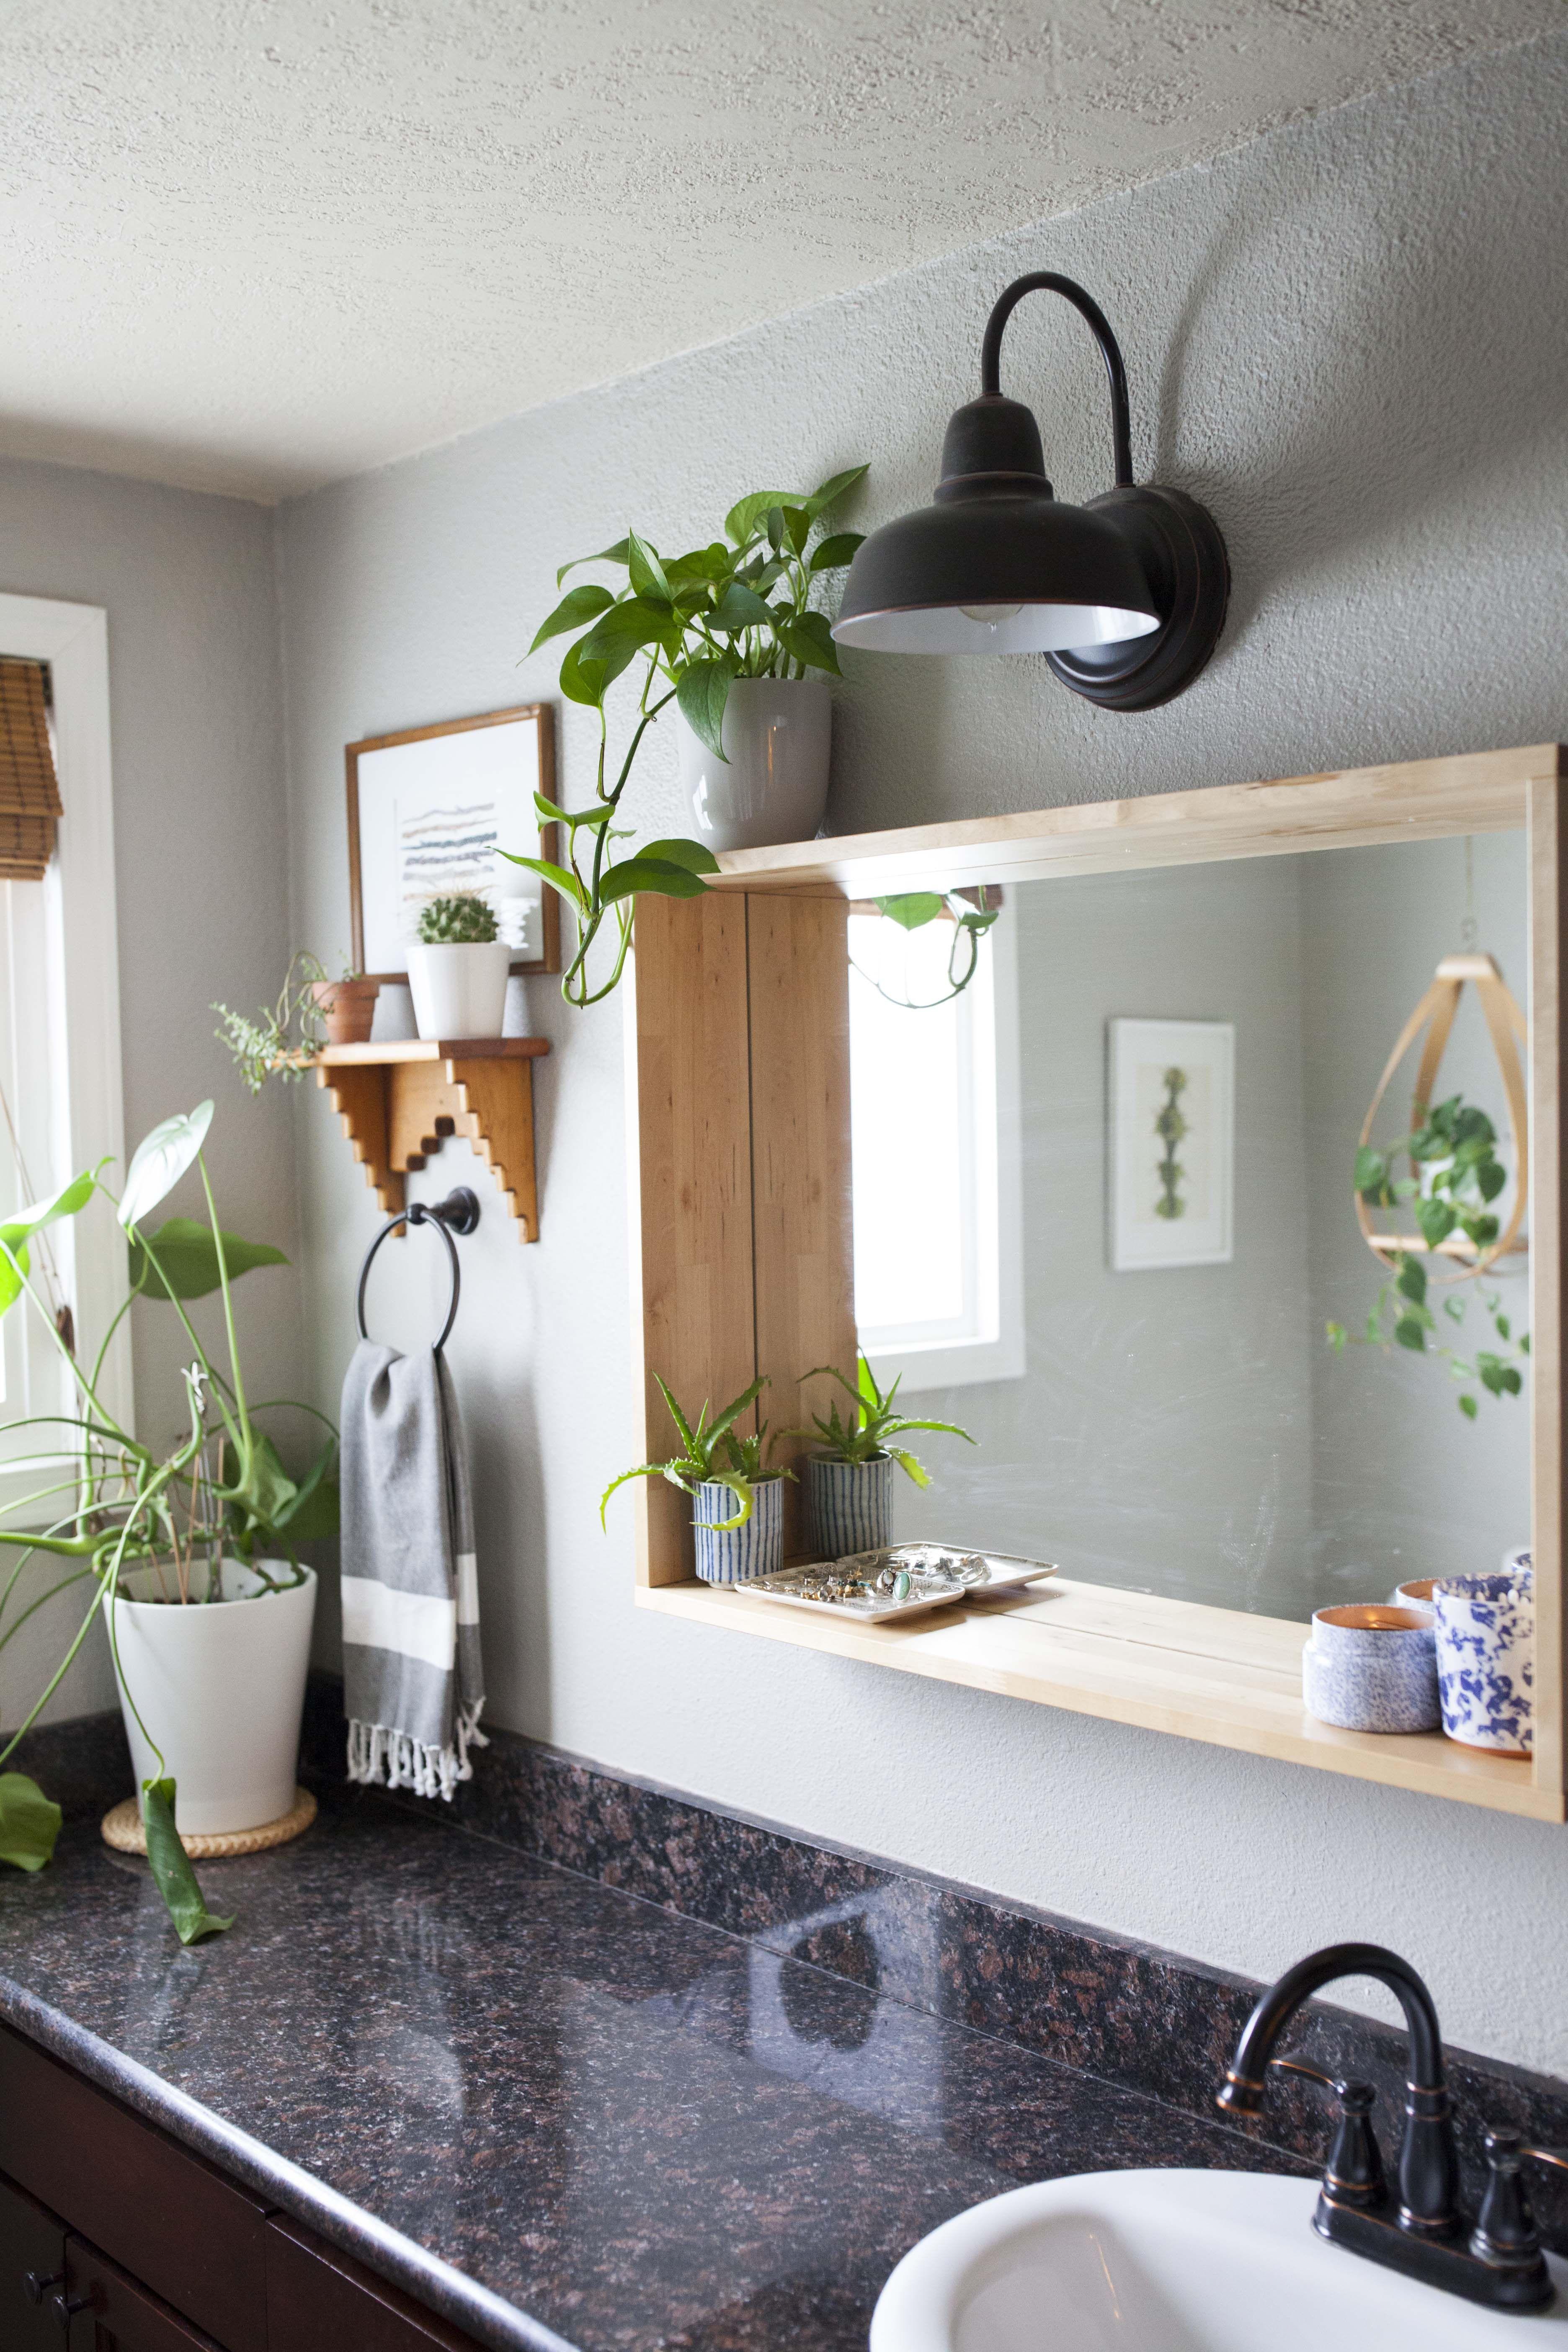 11 Budget Ways To Upgrade Your Basic Frameless Bathroom